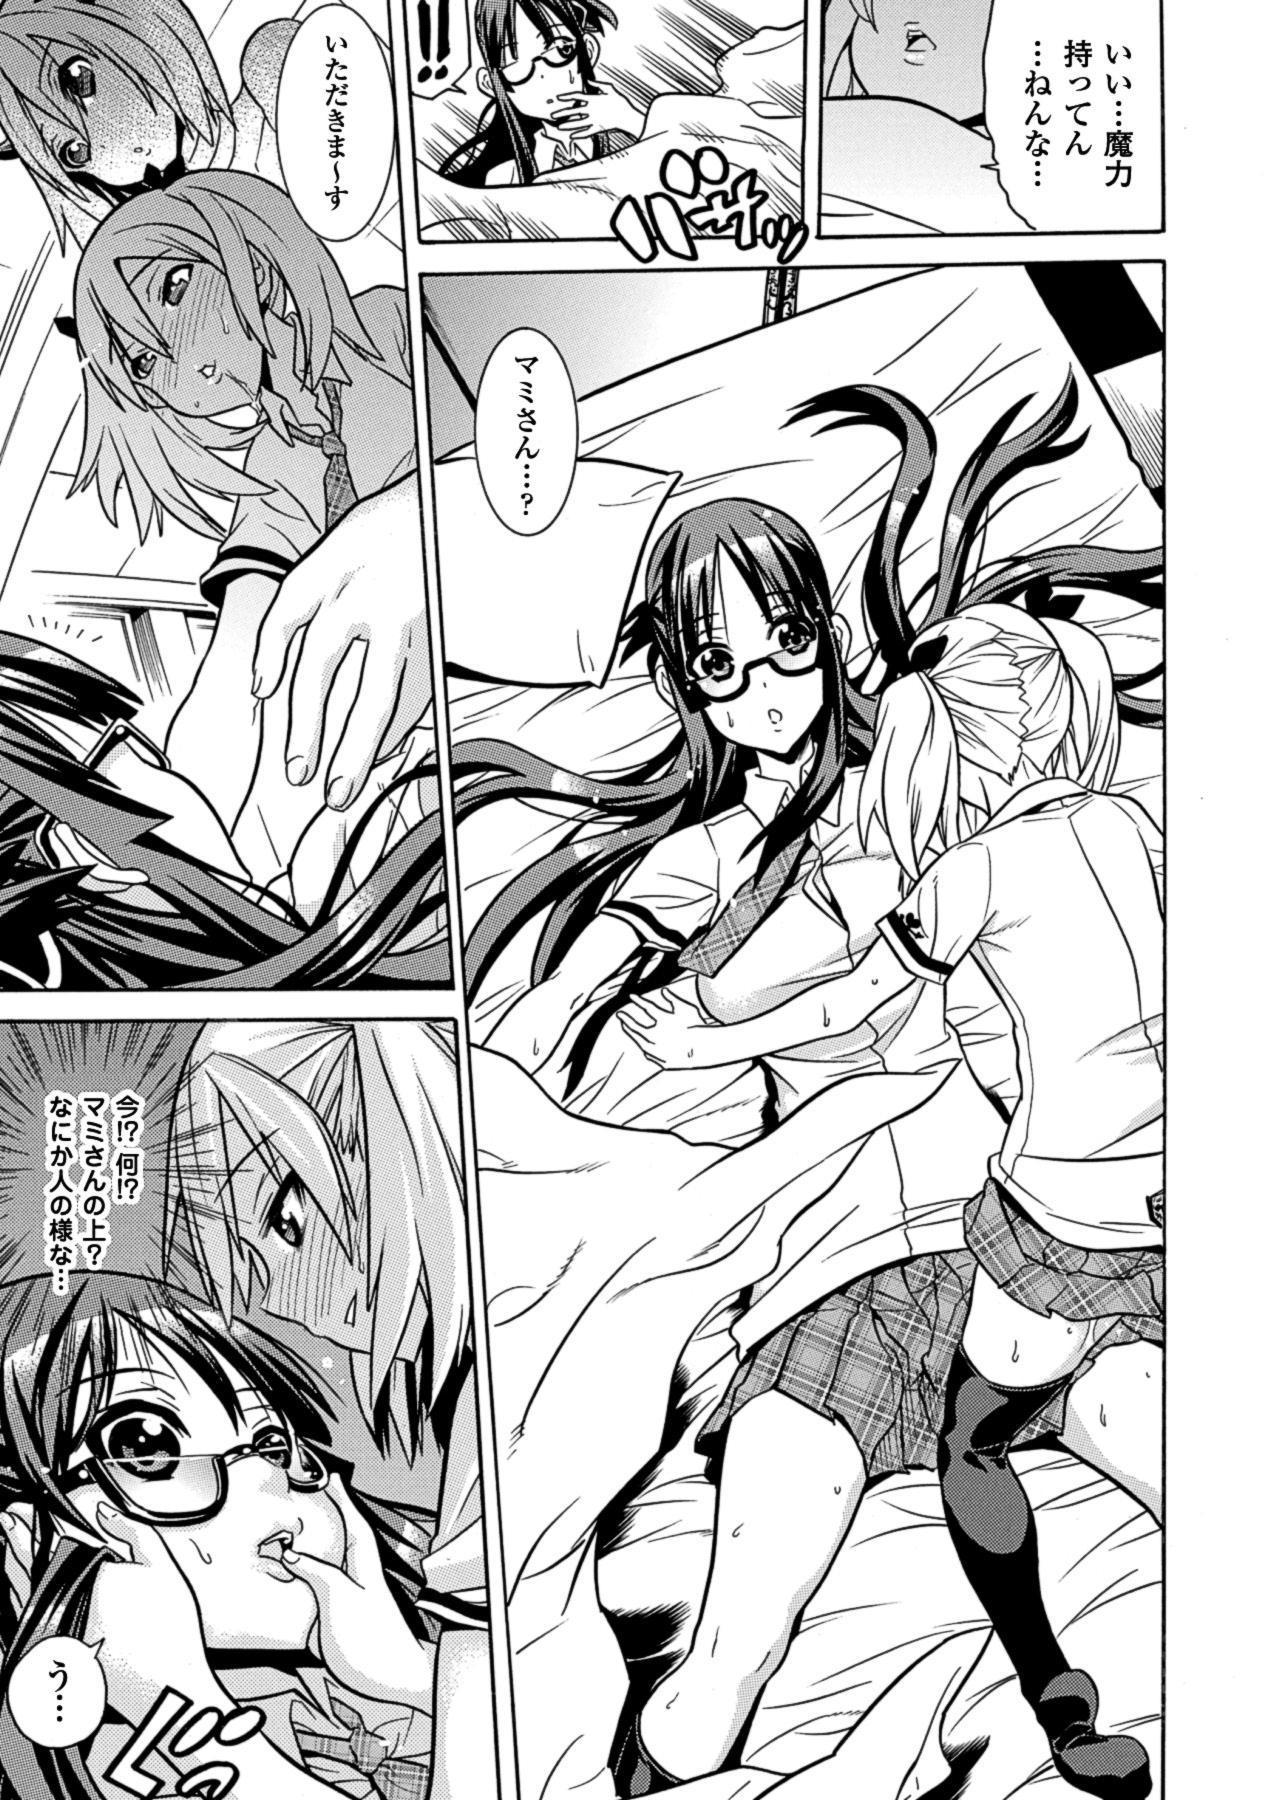 Megami Crisis 10 98